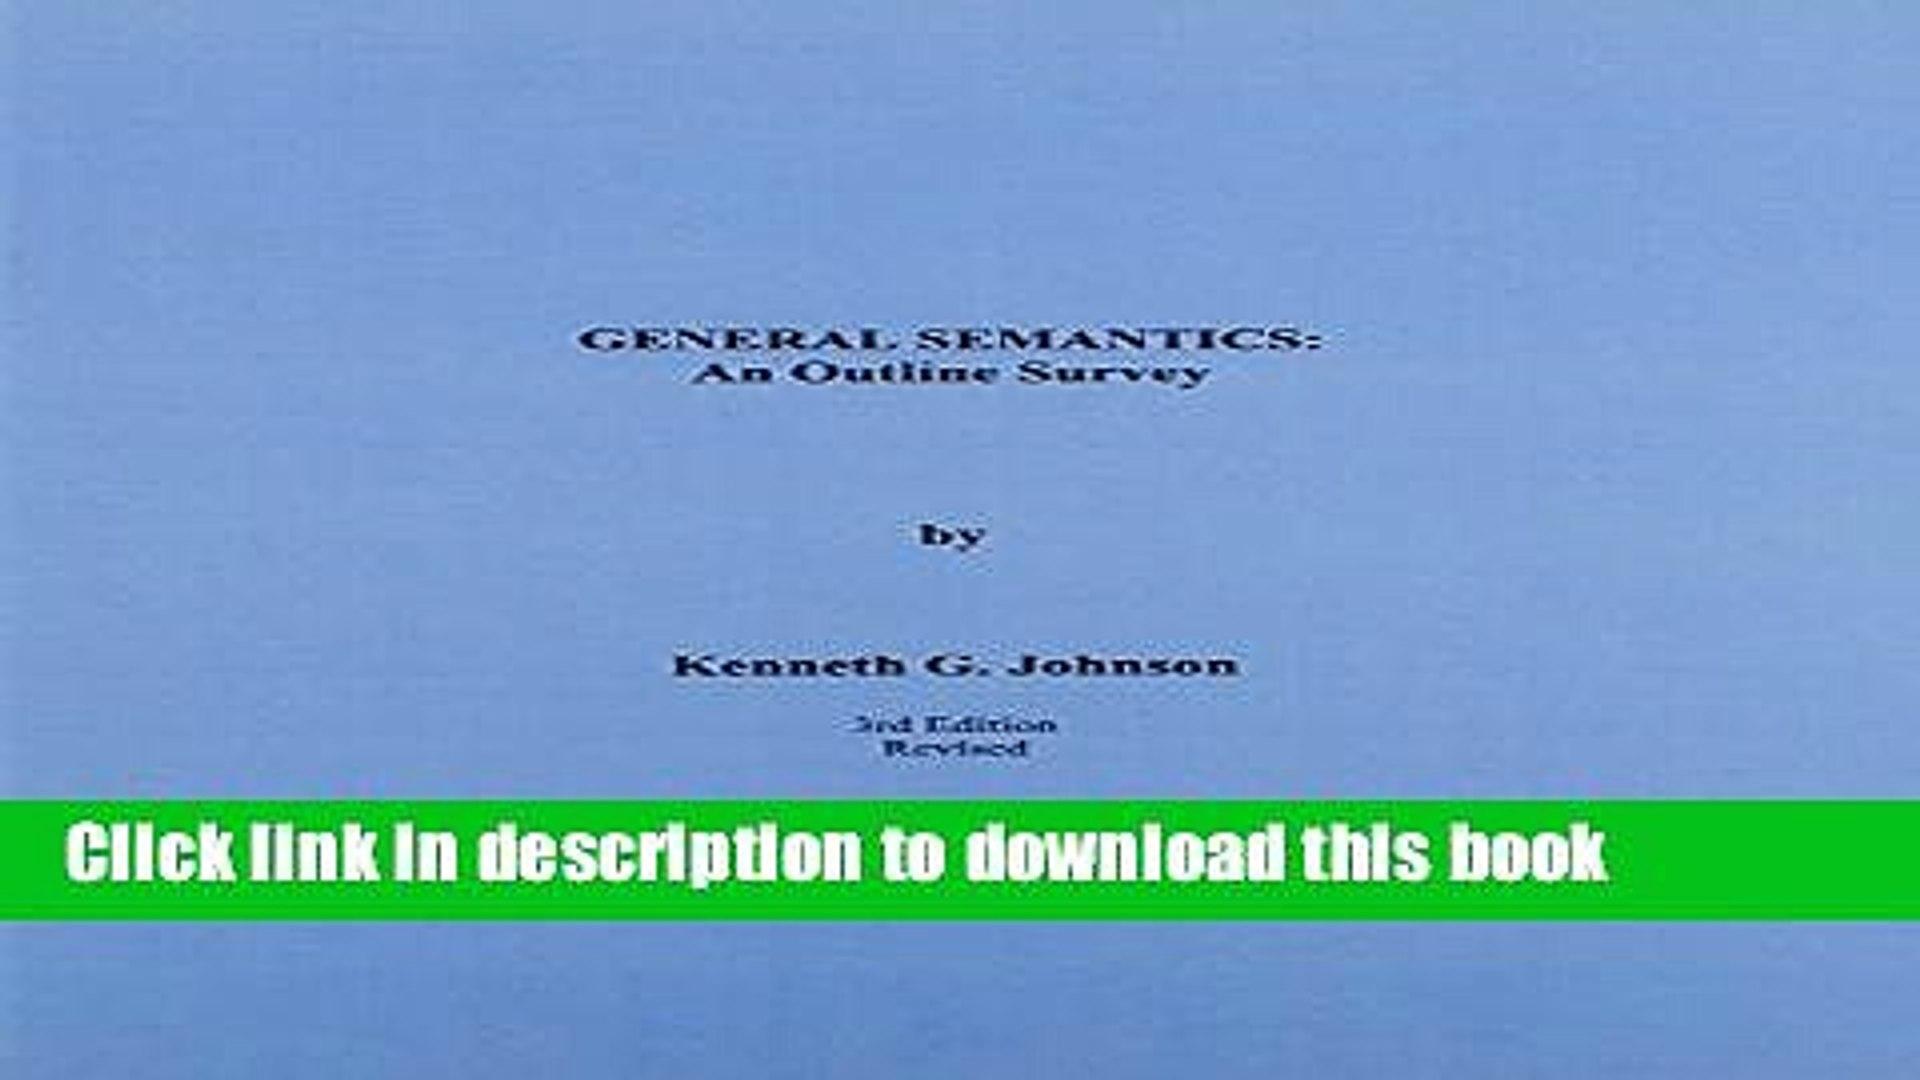 Drive Yourself Sane Third Edition. Using the Uncommon Sense of General Semantics